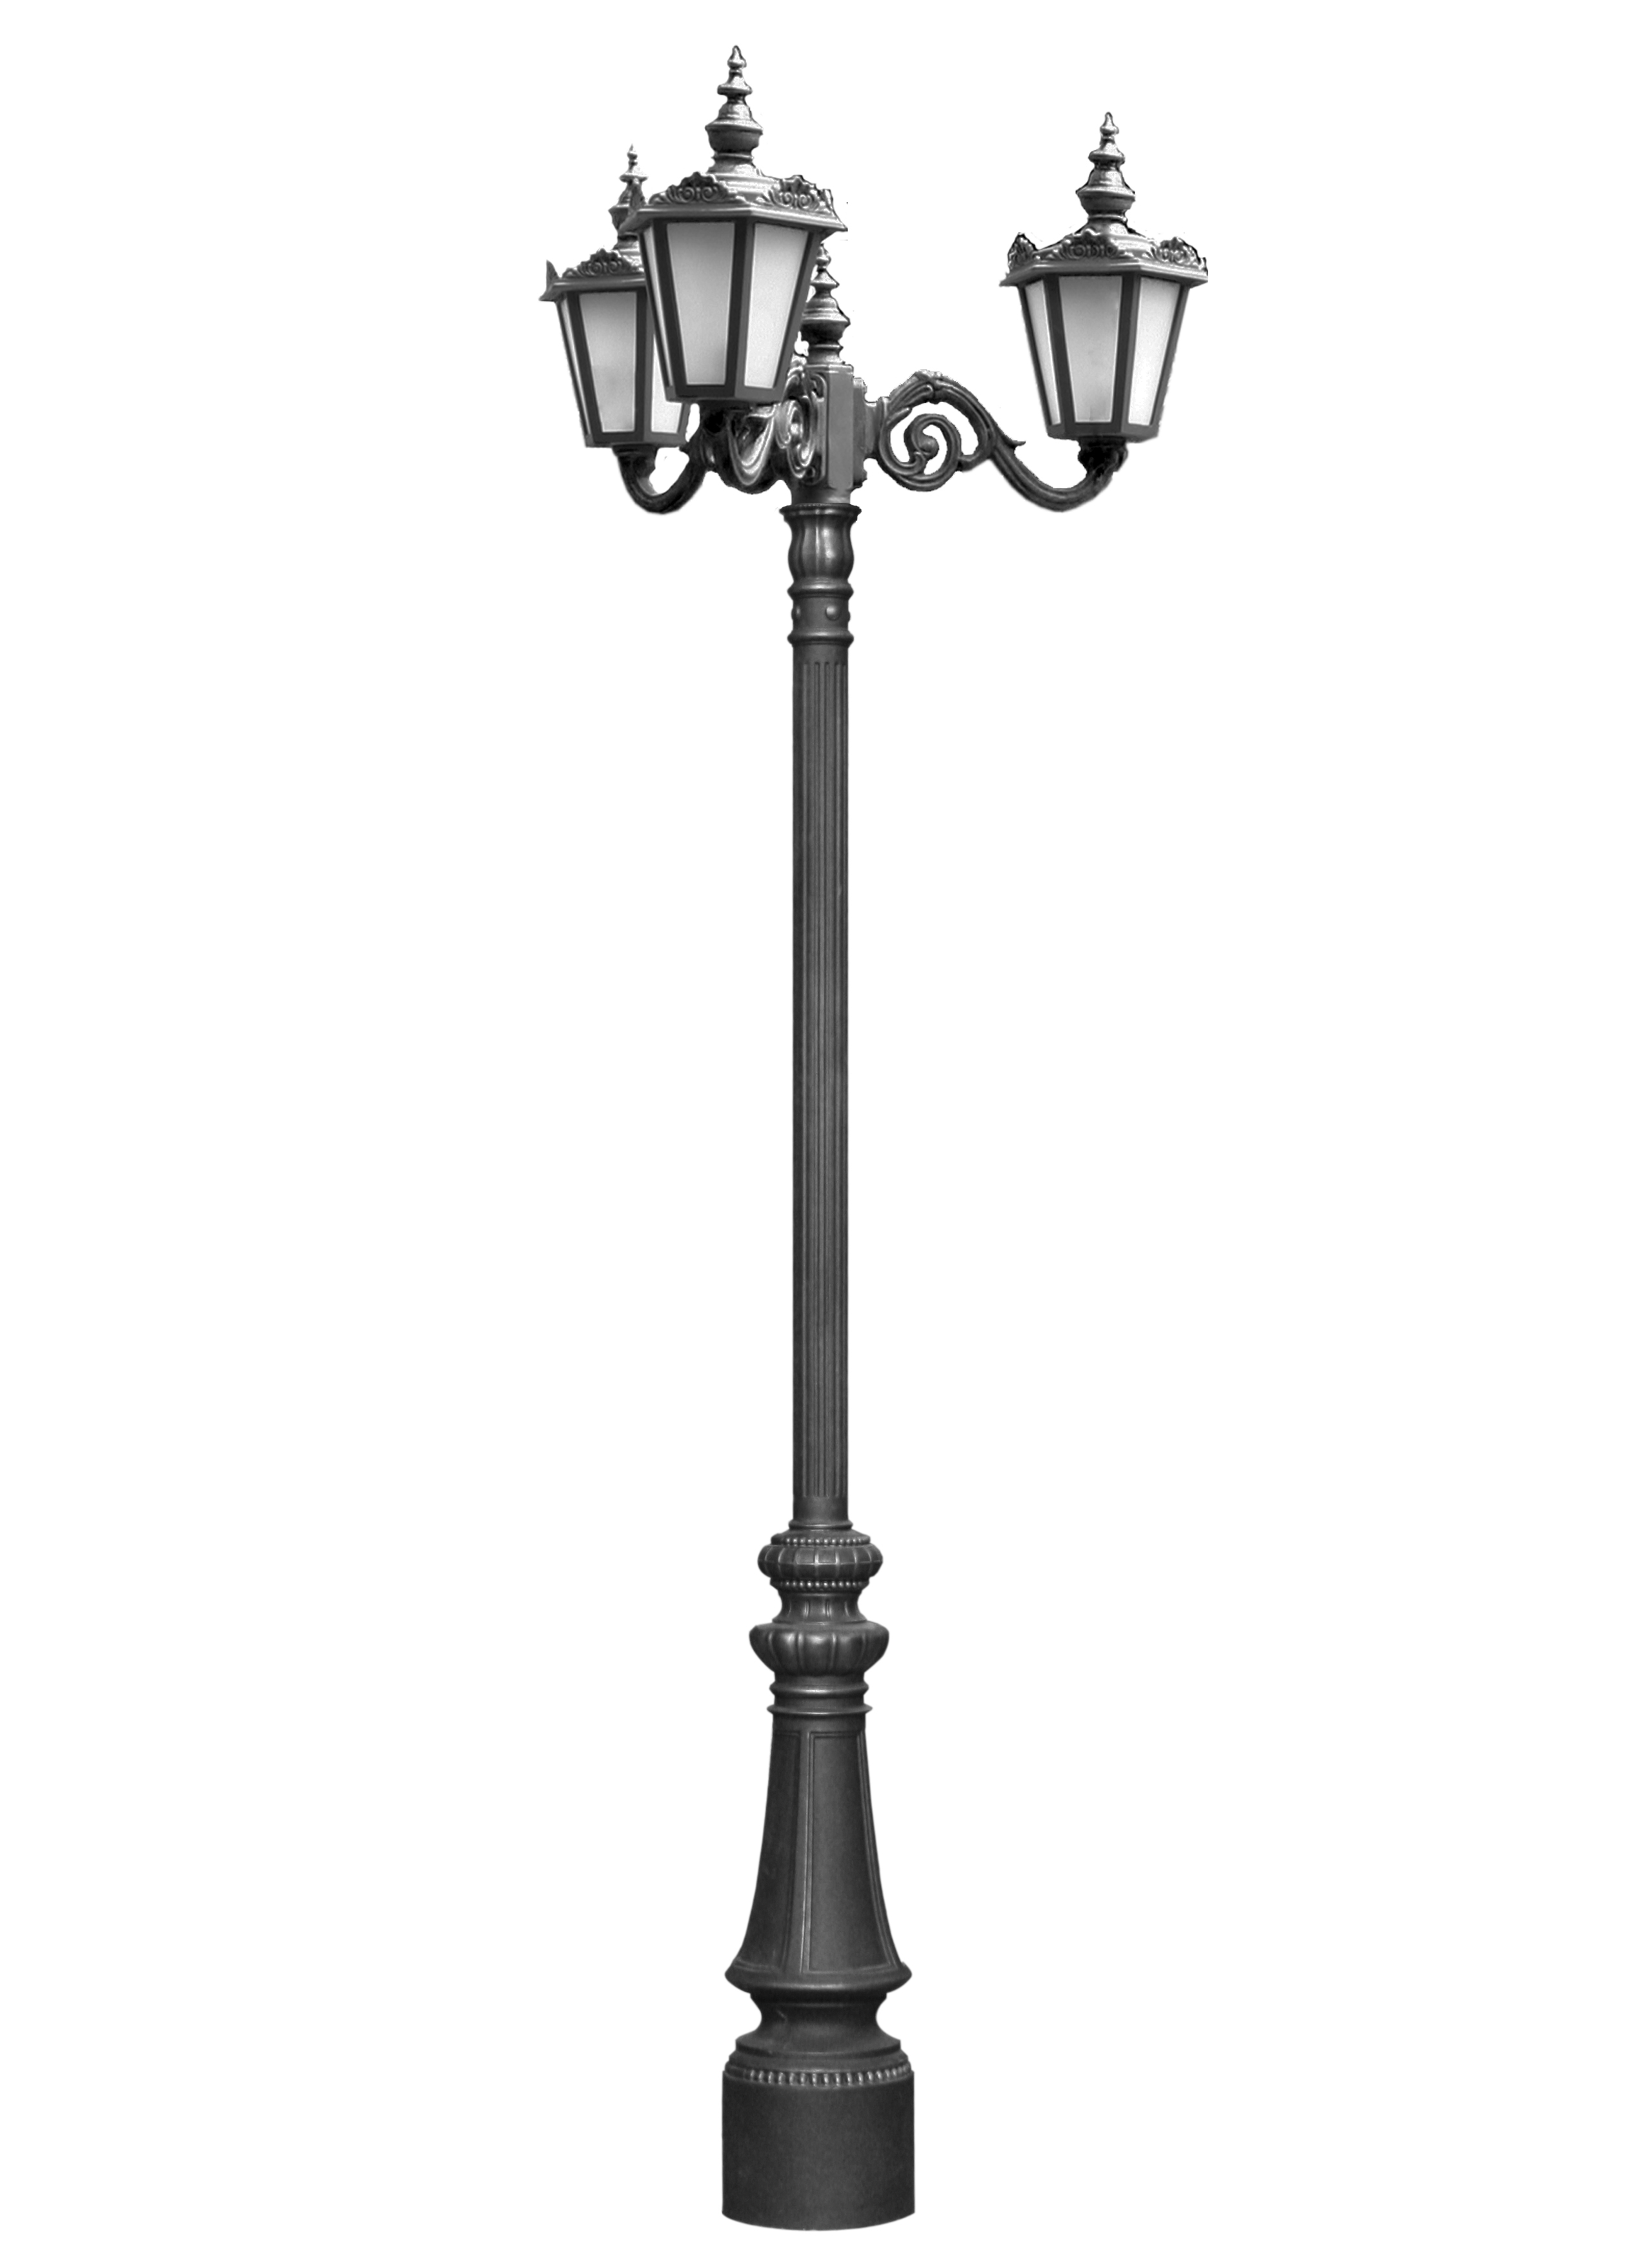 Stalpi ornamentali pentru iluminat stradal, parcuri, gradini BRAMAL LIGHT - Poza 6